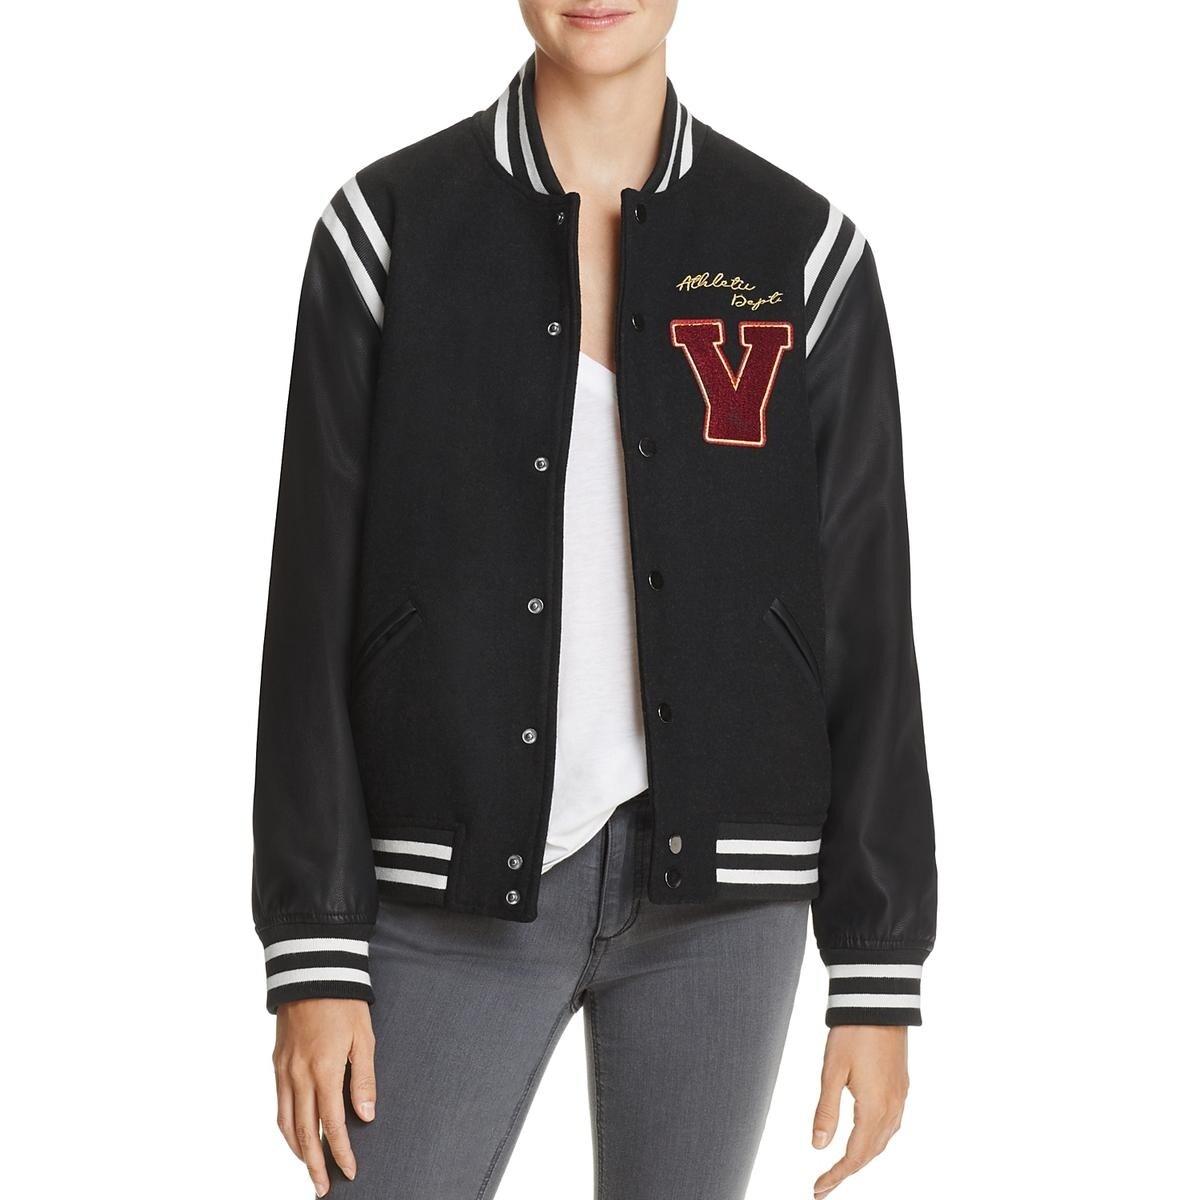 5eff6c2e2 Vintage Havana Womens Brooklyn Champs Bomber Jacket Leather Sleeves Varsity  - s